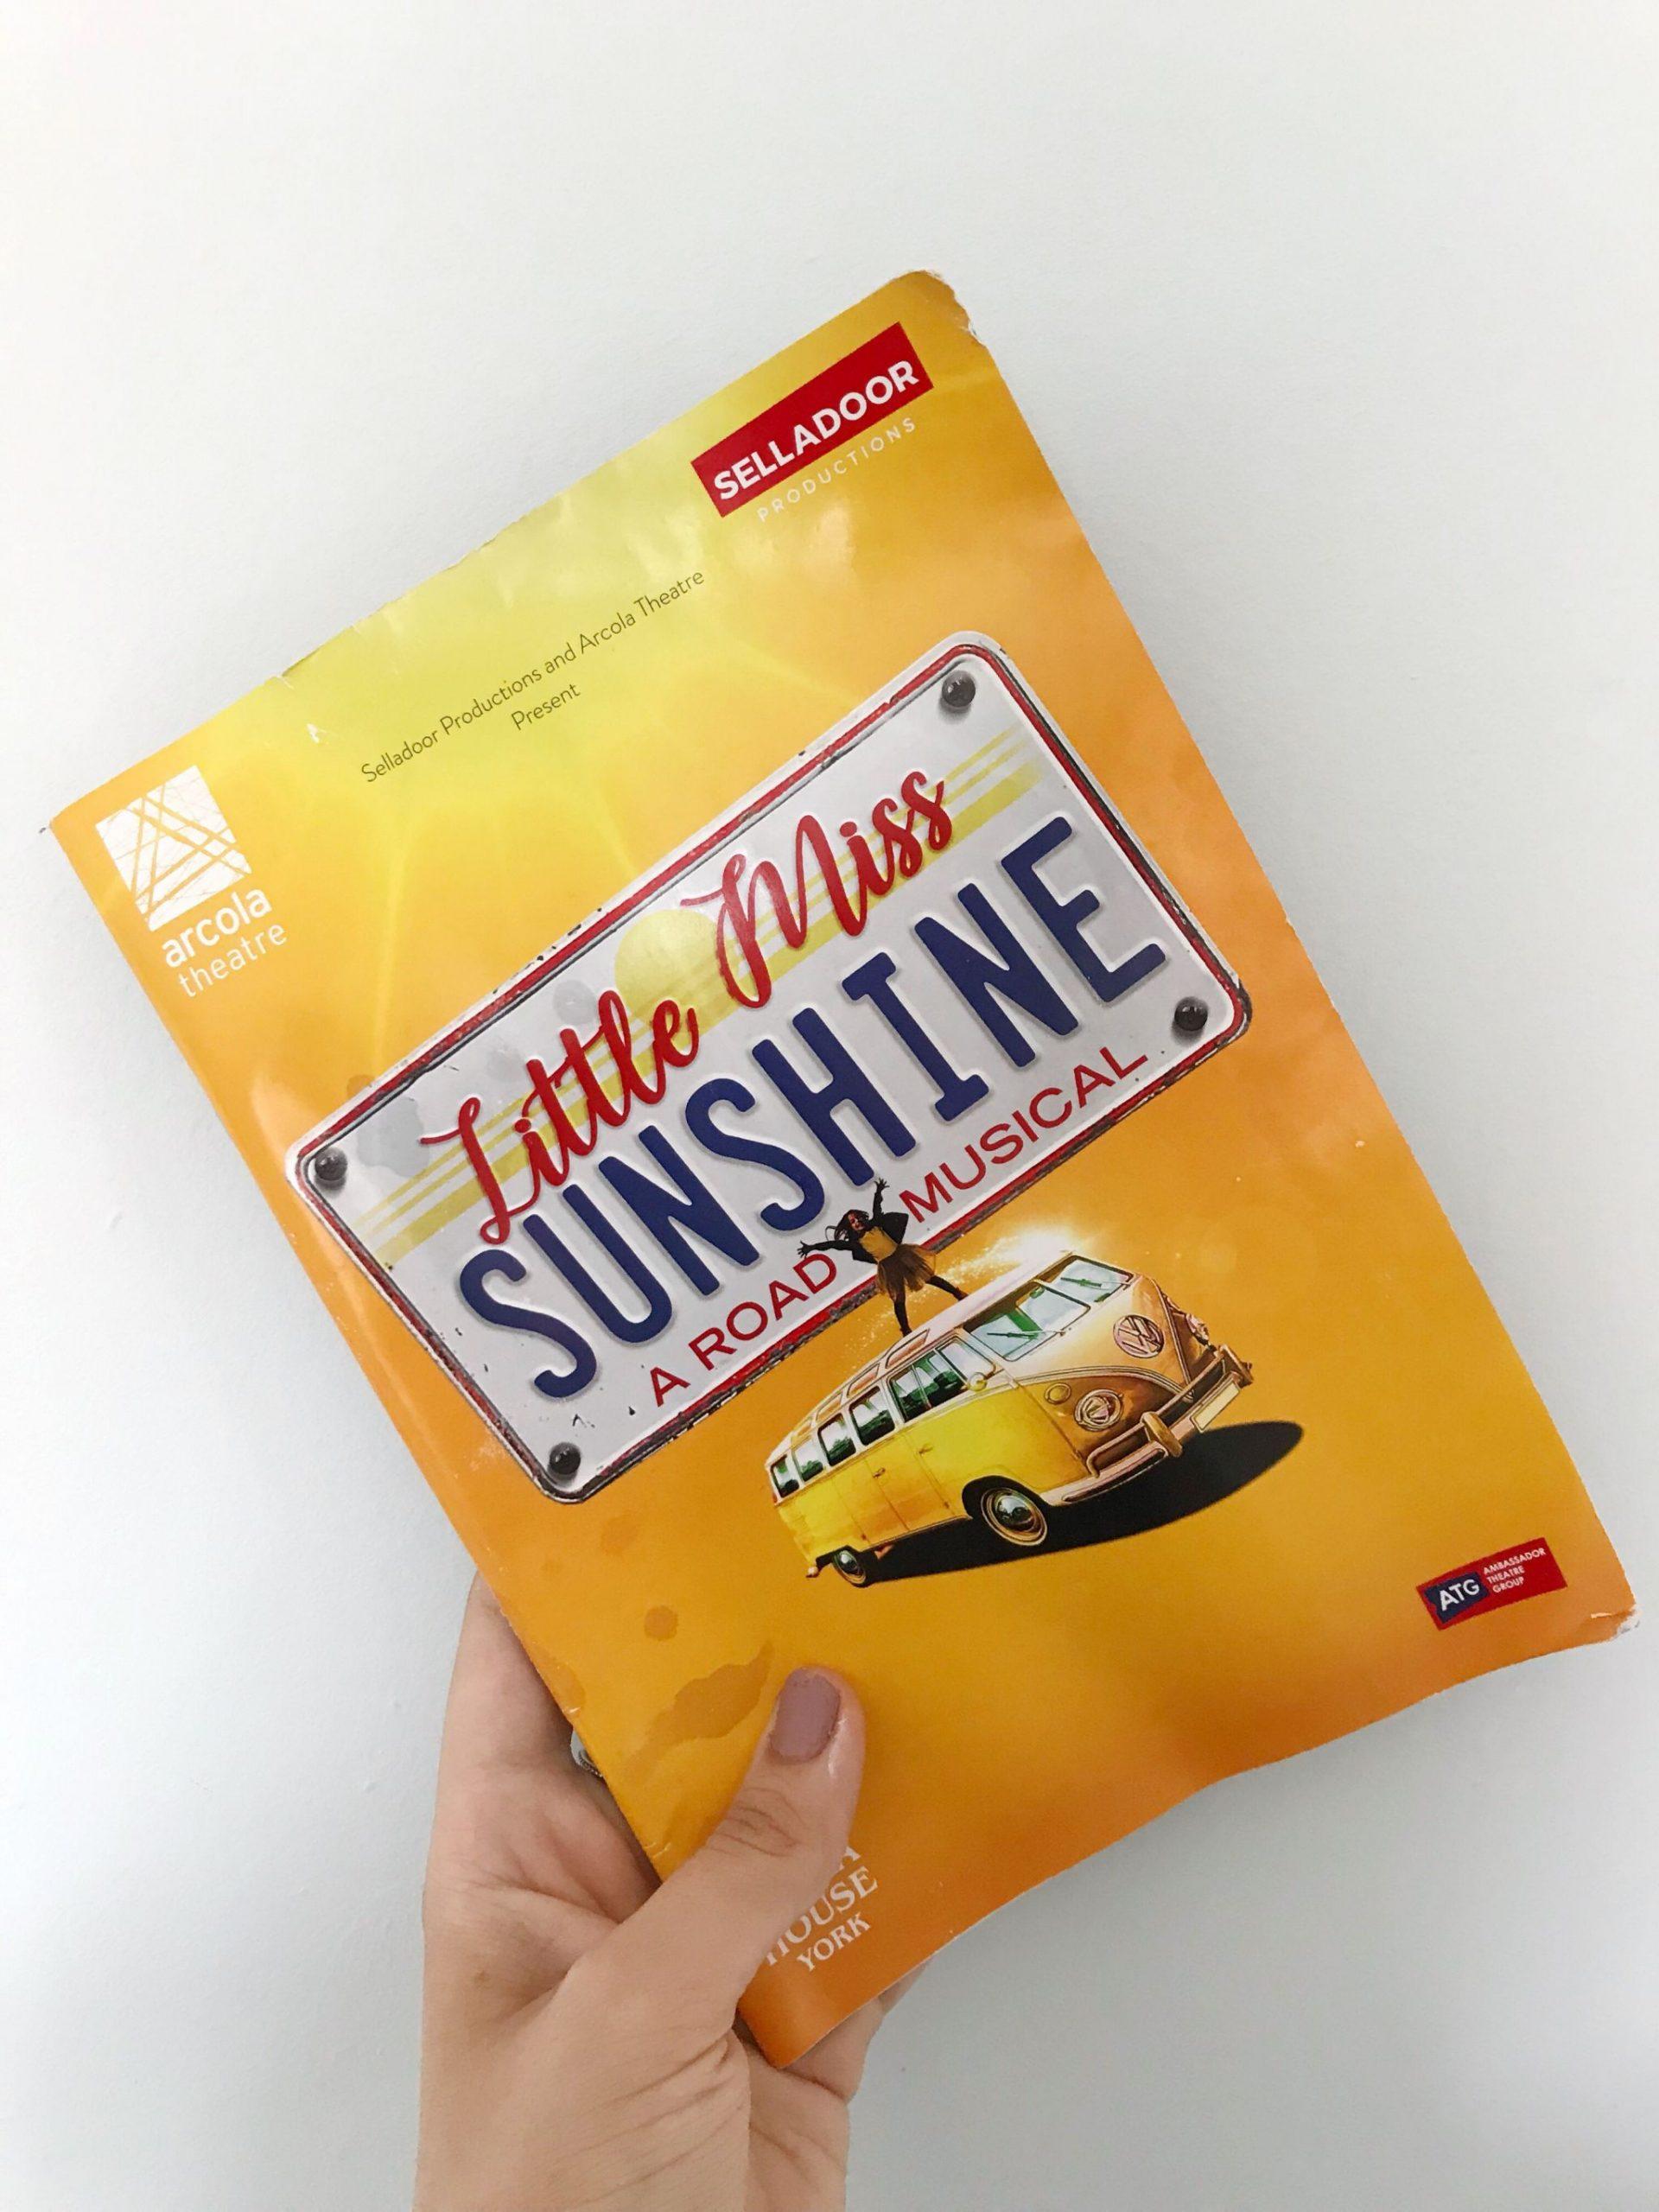 Little Miss Sunshine – A Road Musical*